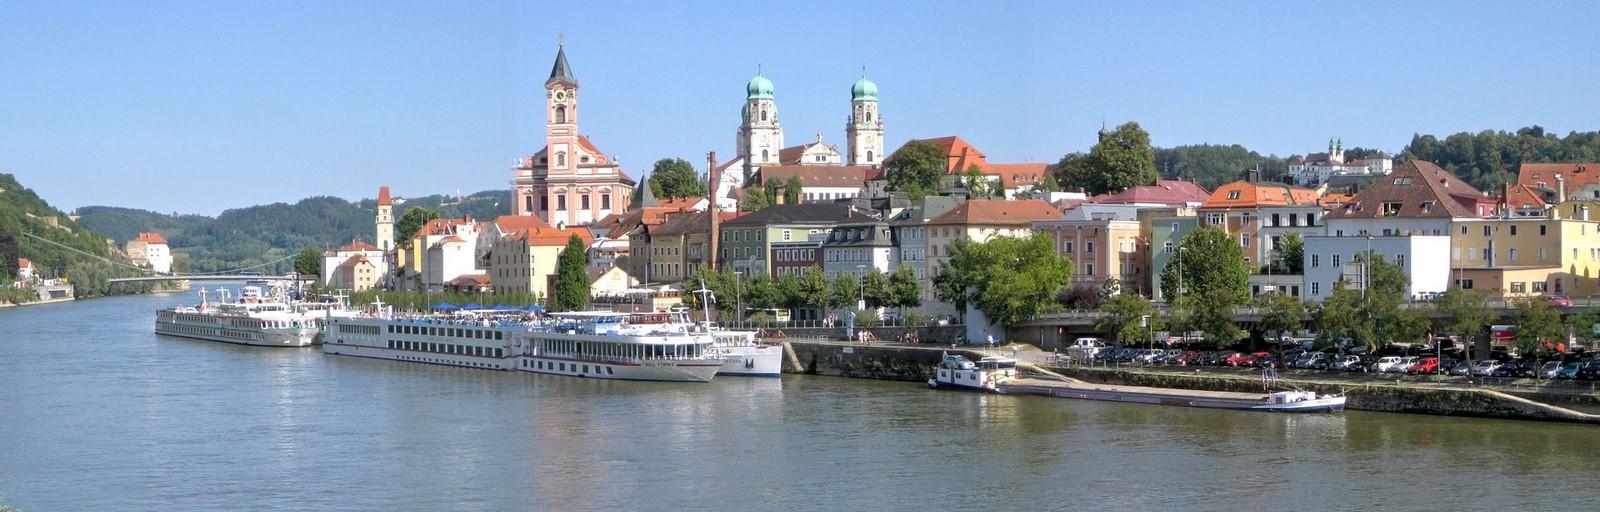 Passau and the Danube - Sheet1